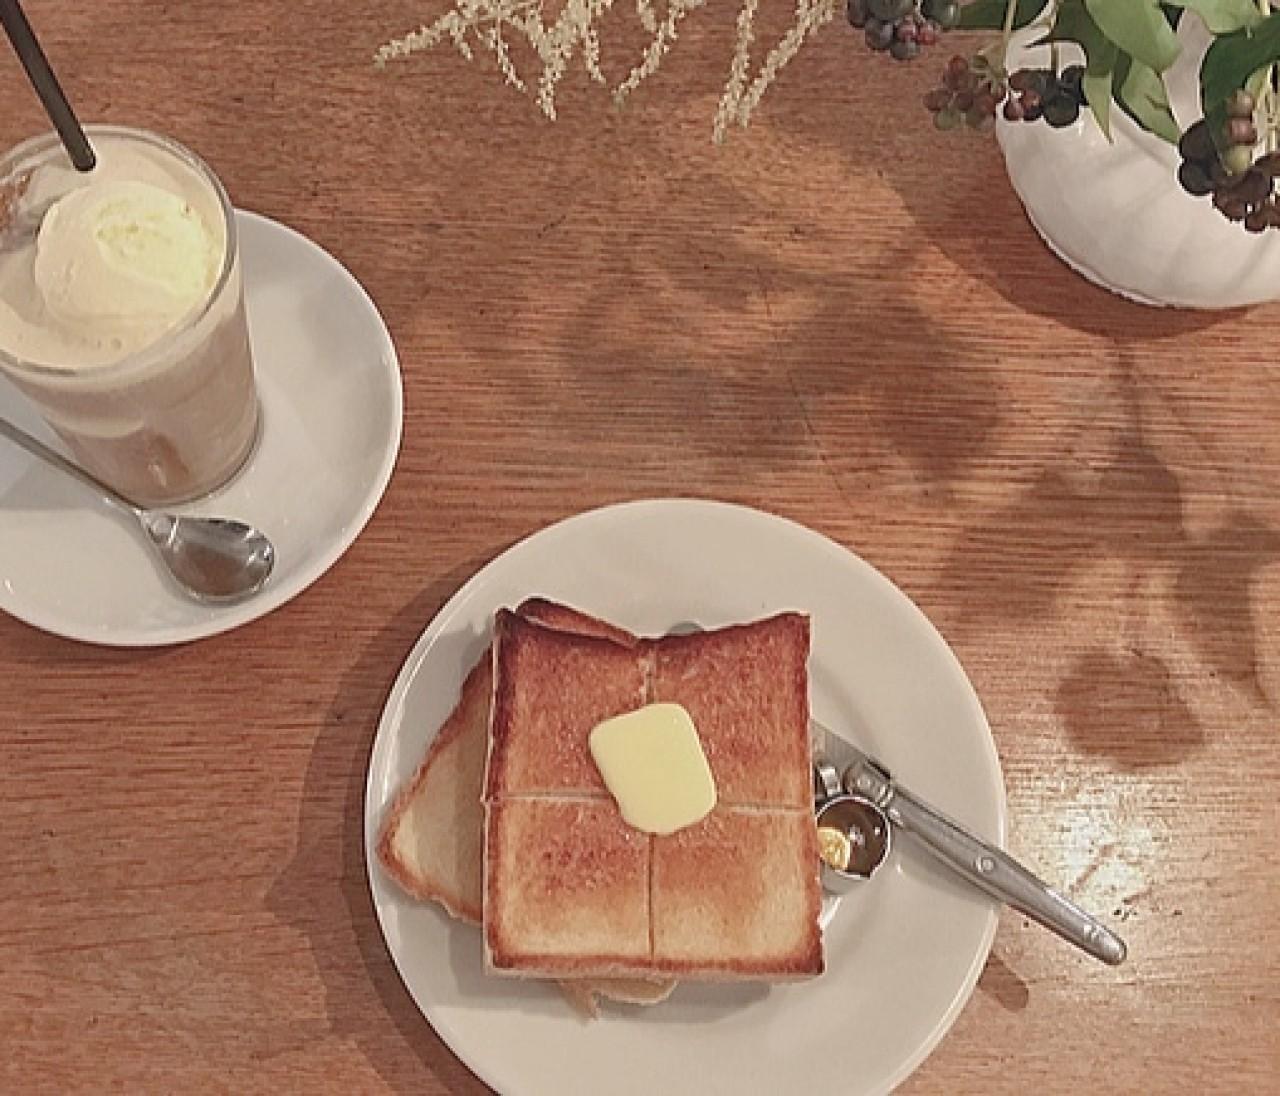 cafe活♡通勤コーデはUNIQLO+1で格上げ